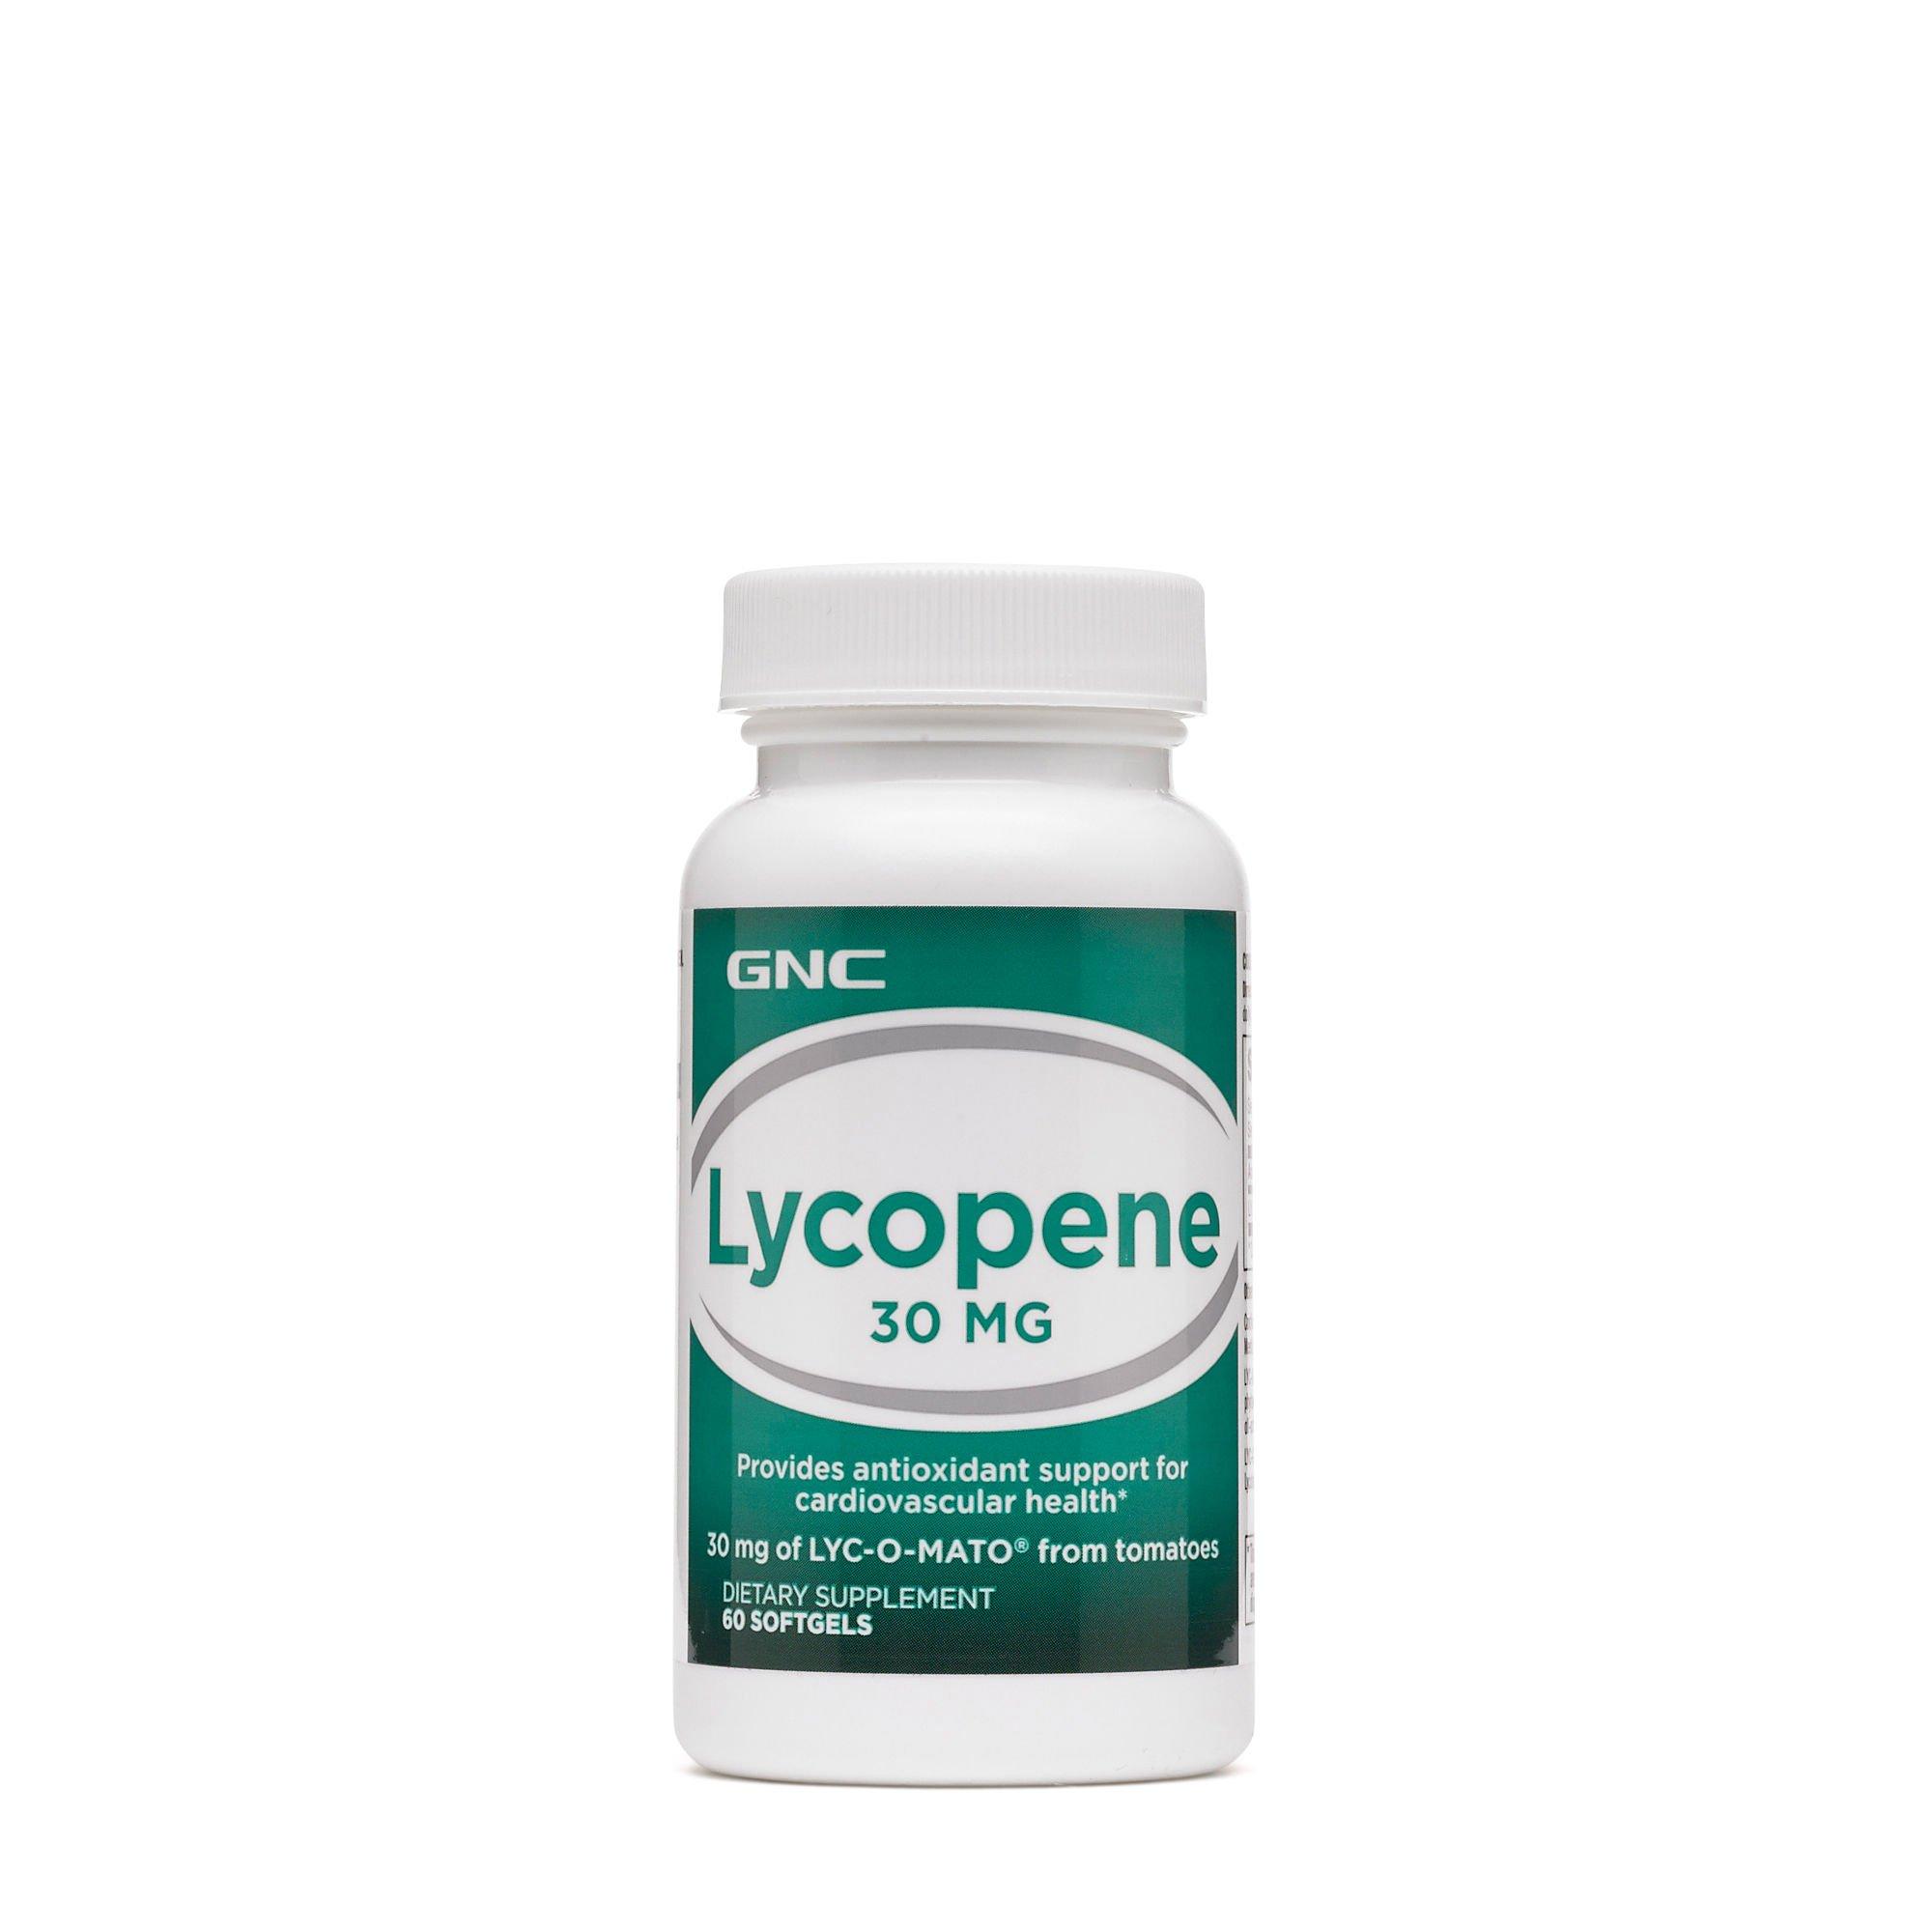 GNC Lycopene 30mg, 60 Softgels, Supports Cardiovascular Health